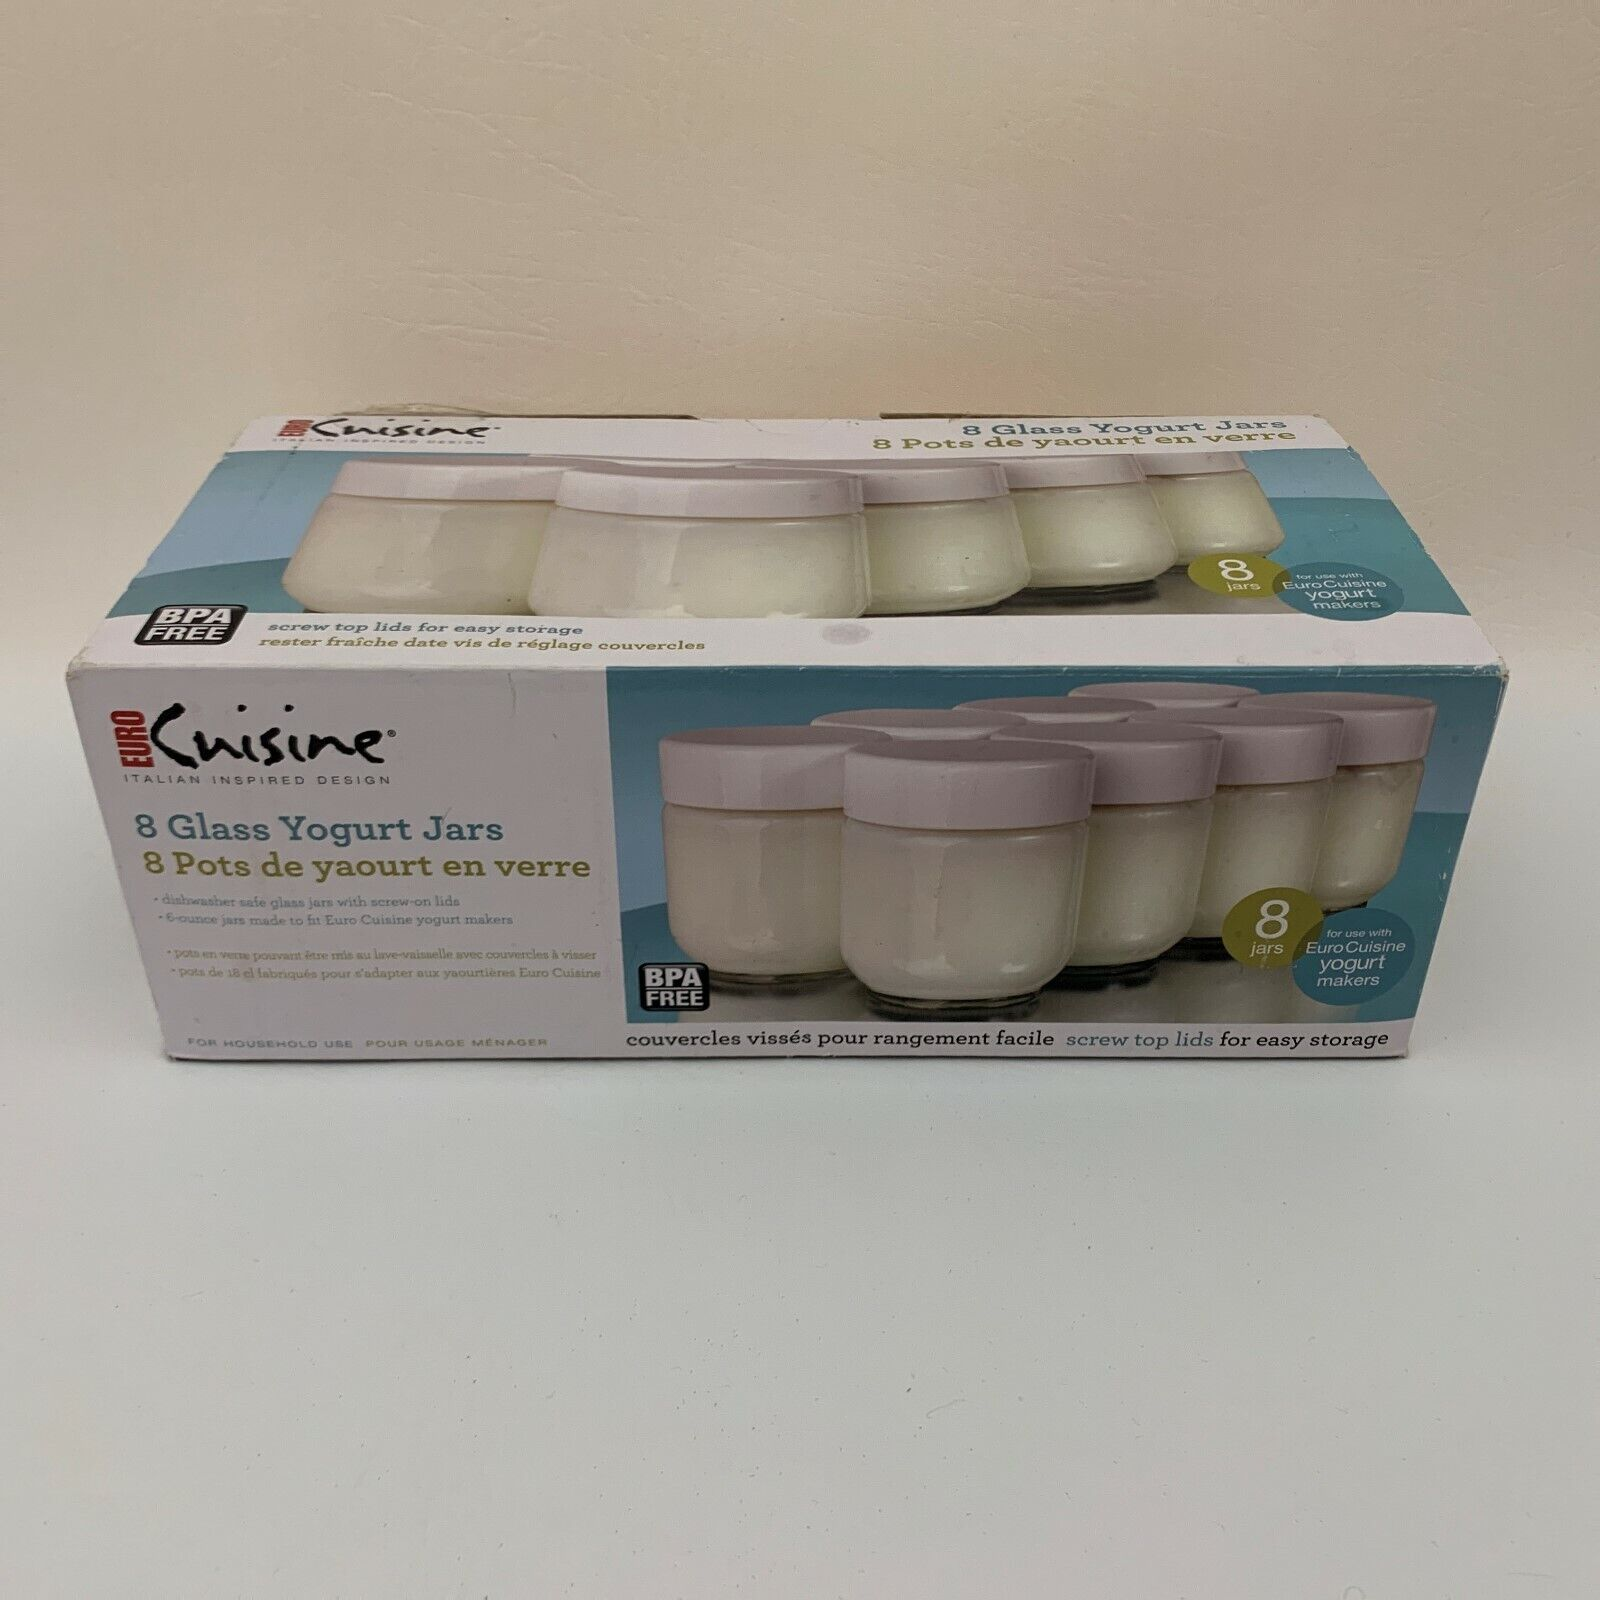 8 Euro Cuisine 6 Ounce Glass Yogurt Jars Dishwasher Safe wit